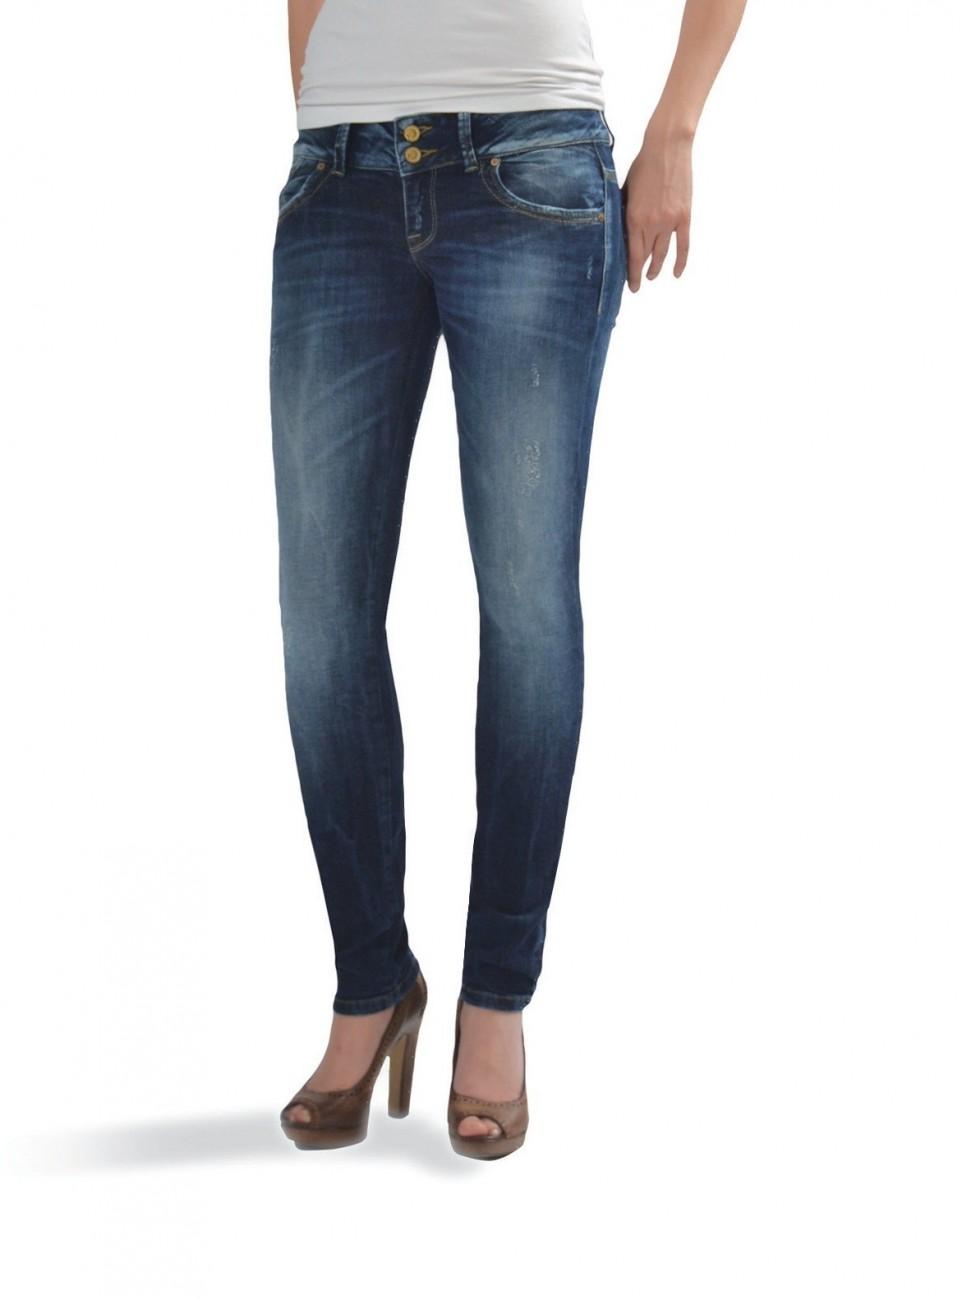 LTB Damen Jeans Molly Super Slim Oxford Wash